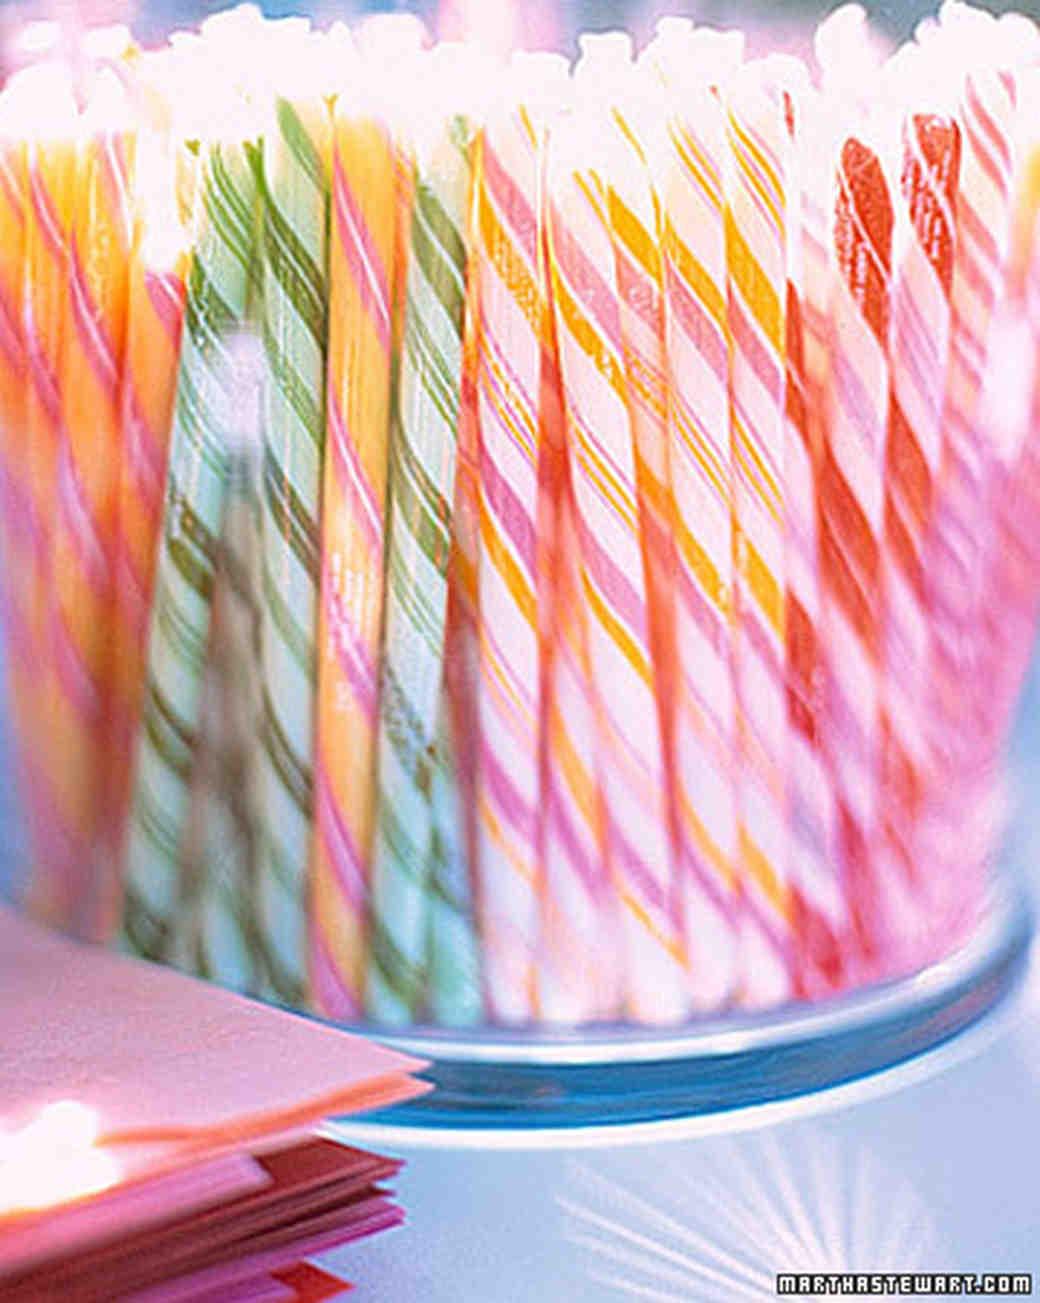 a98497_spr01_candies.jpg